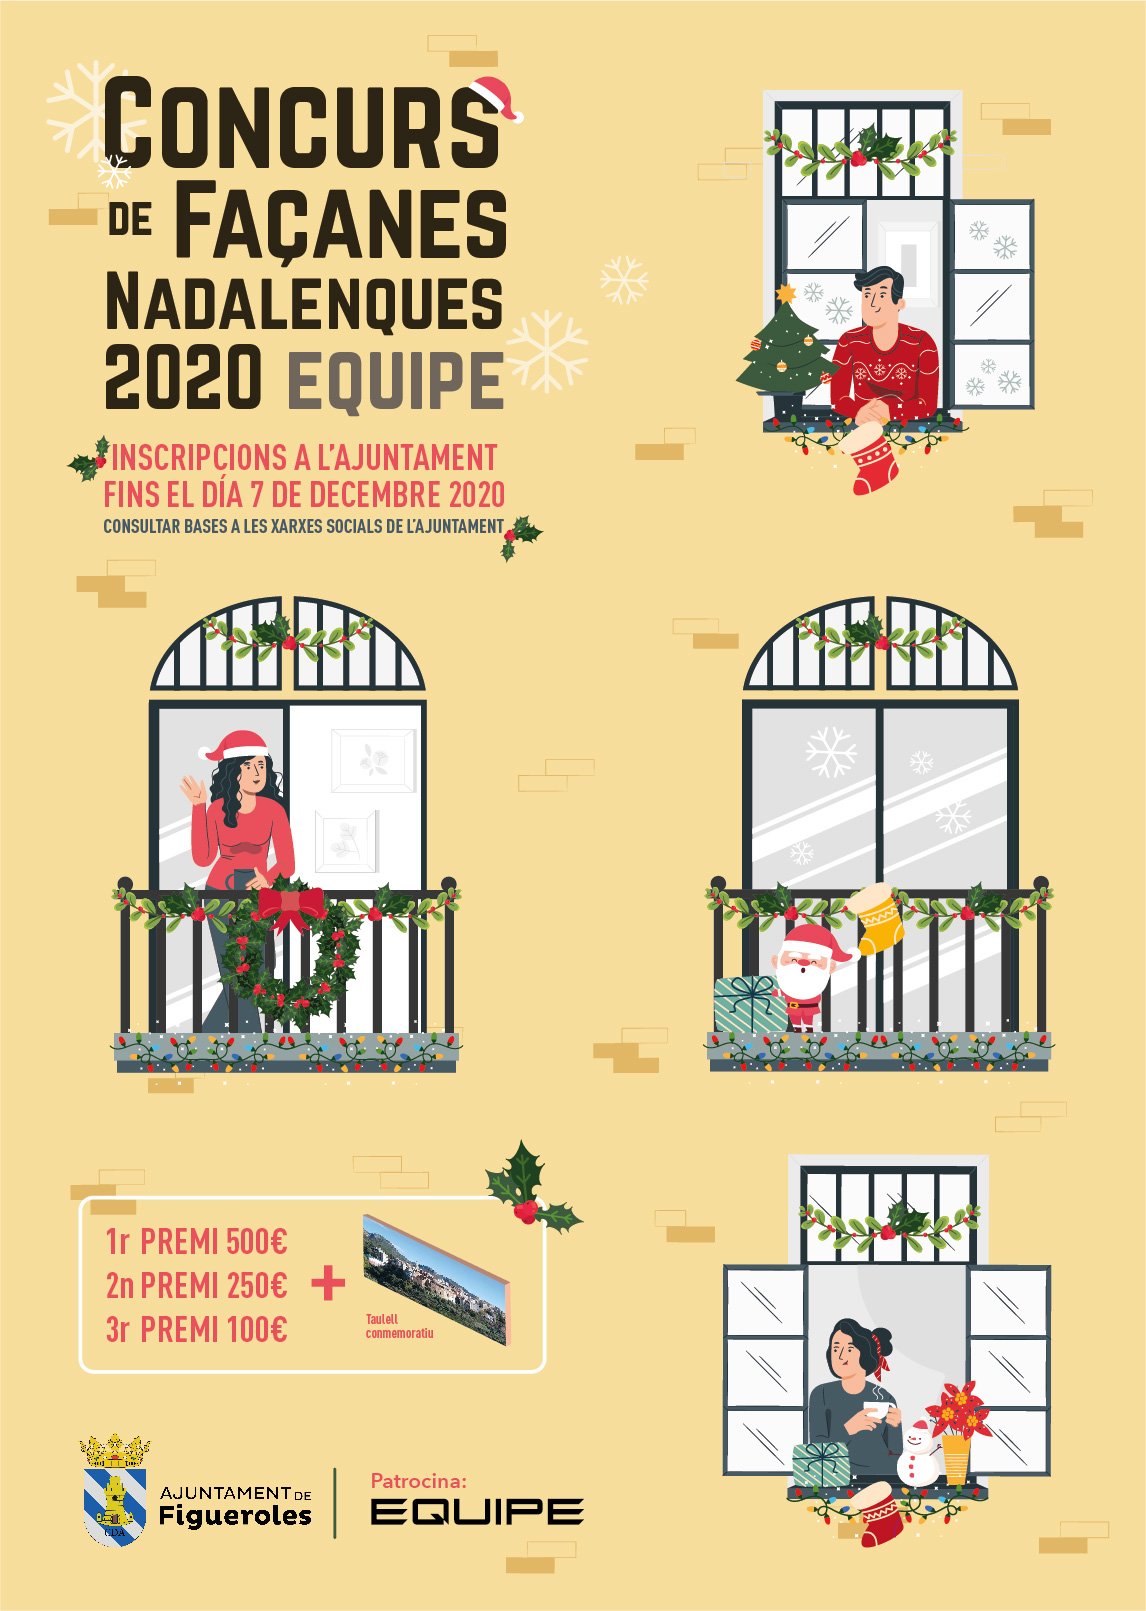 Cartel concurso de cachadas navideñas 2020 - Equipe Cerámicas